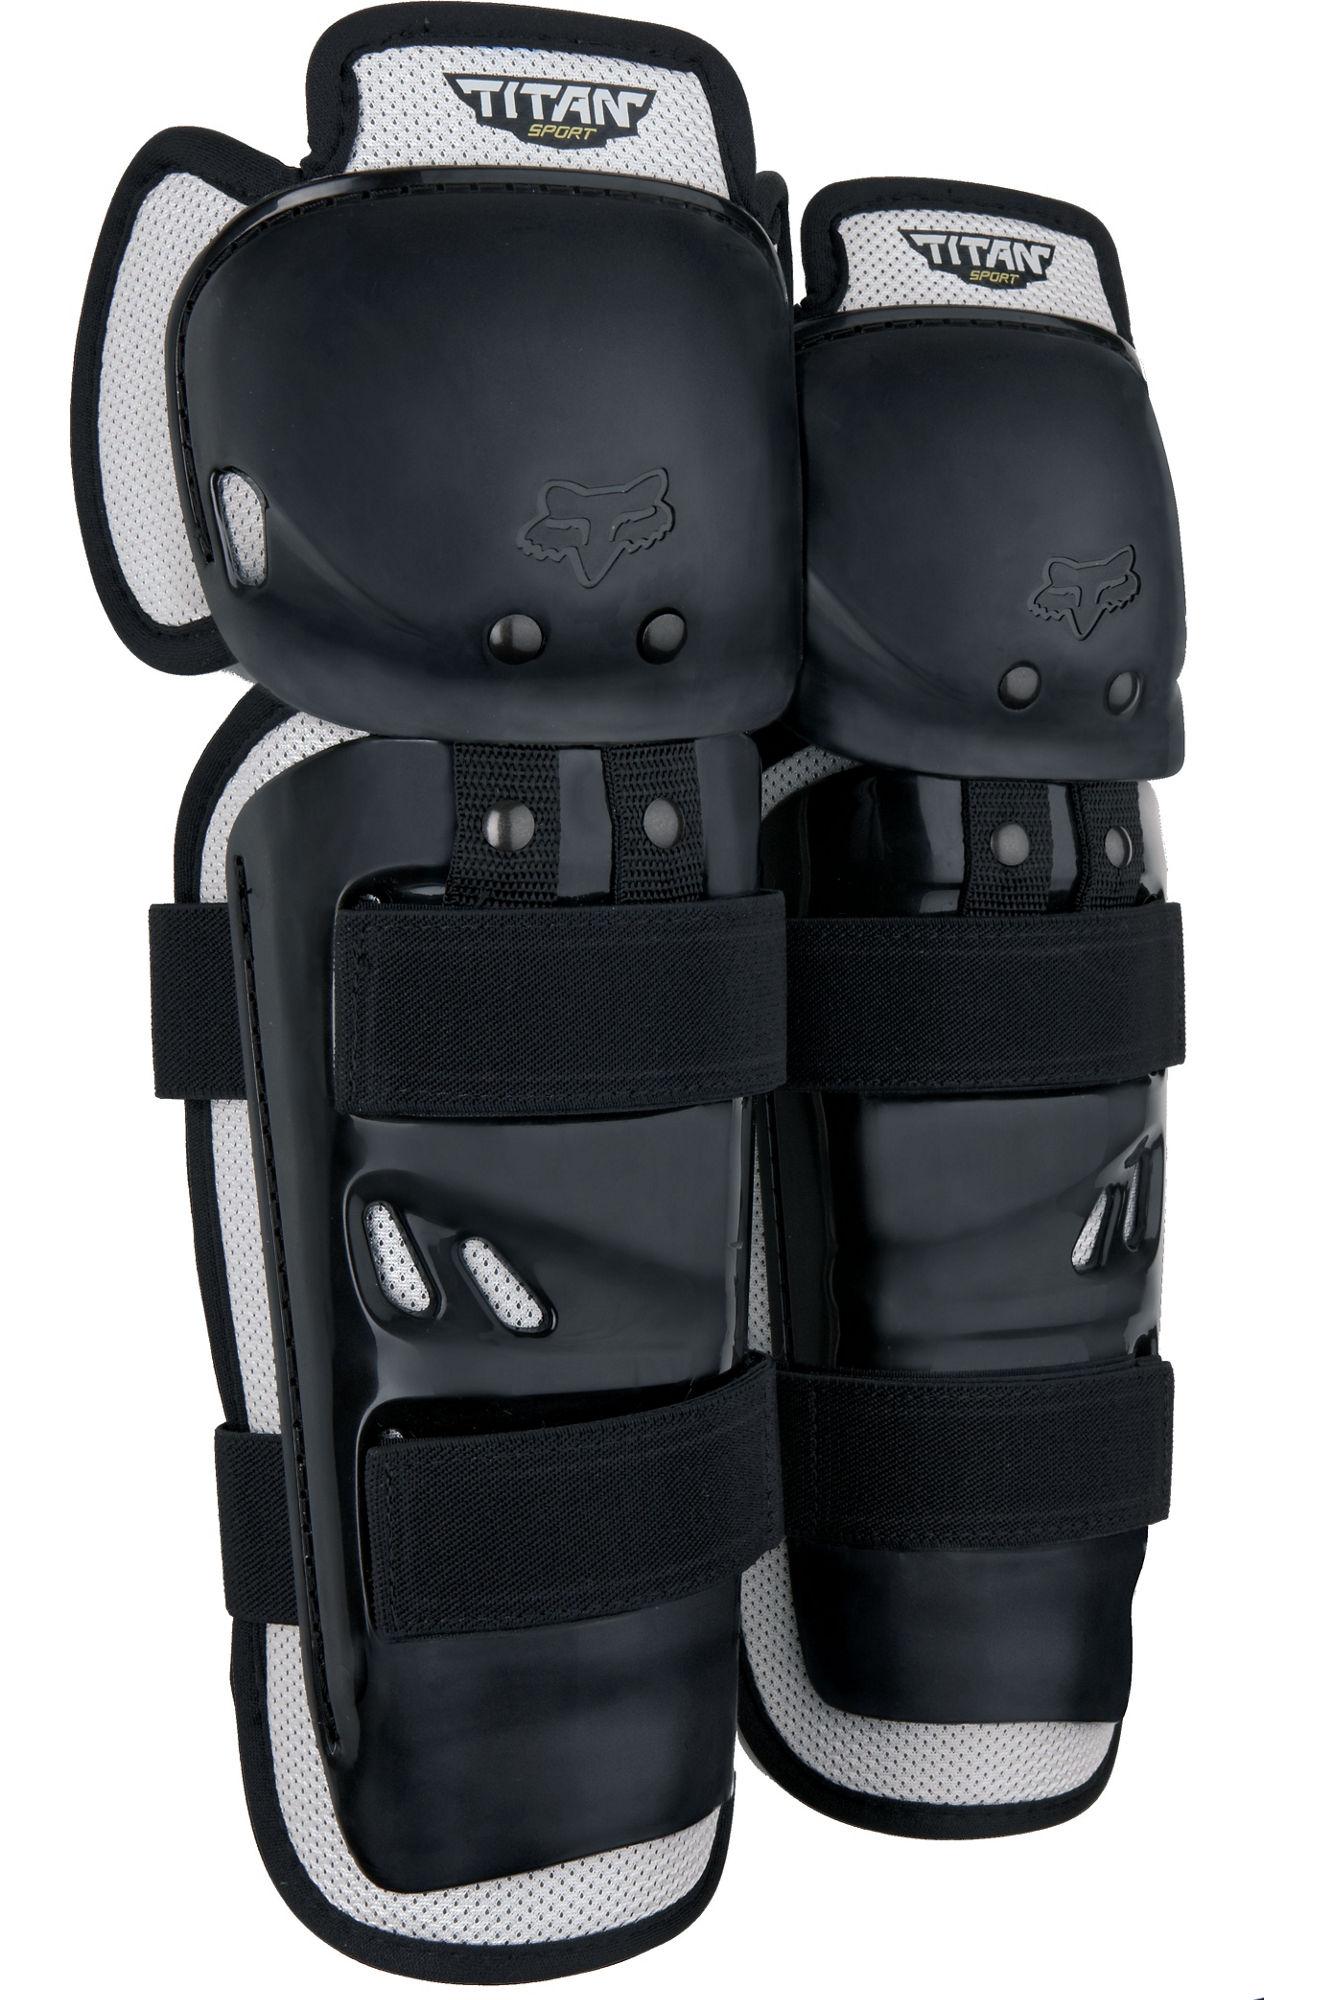 FOX Yth Titan Sport Knee/Shin Guards - OS, Black MX21